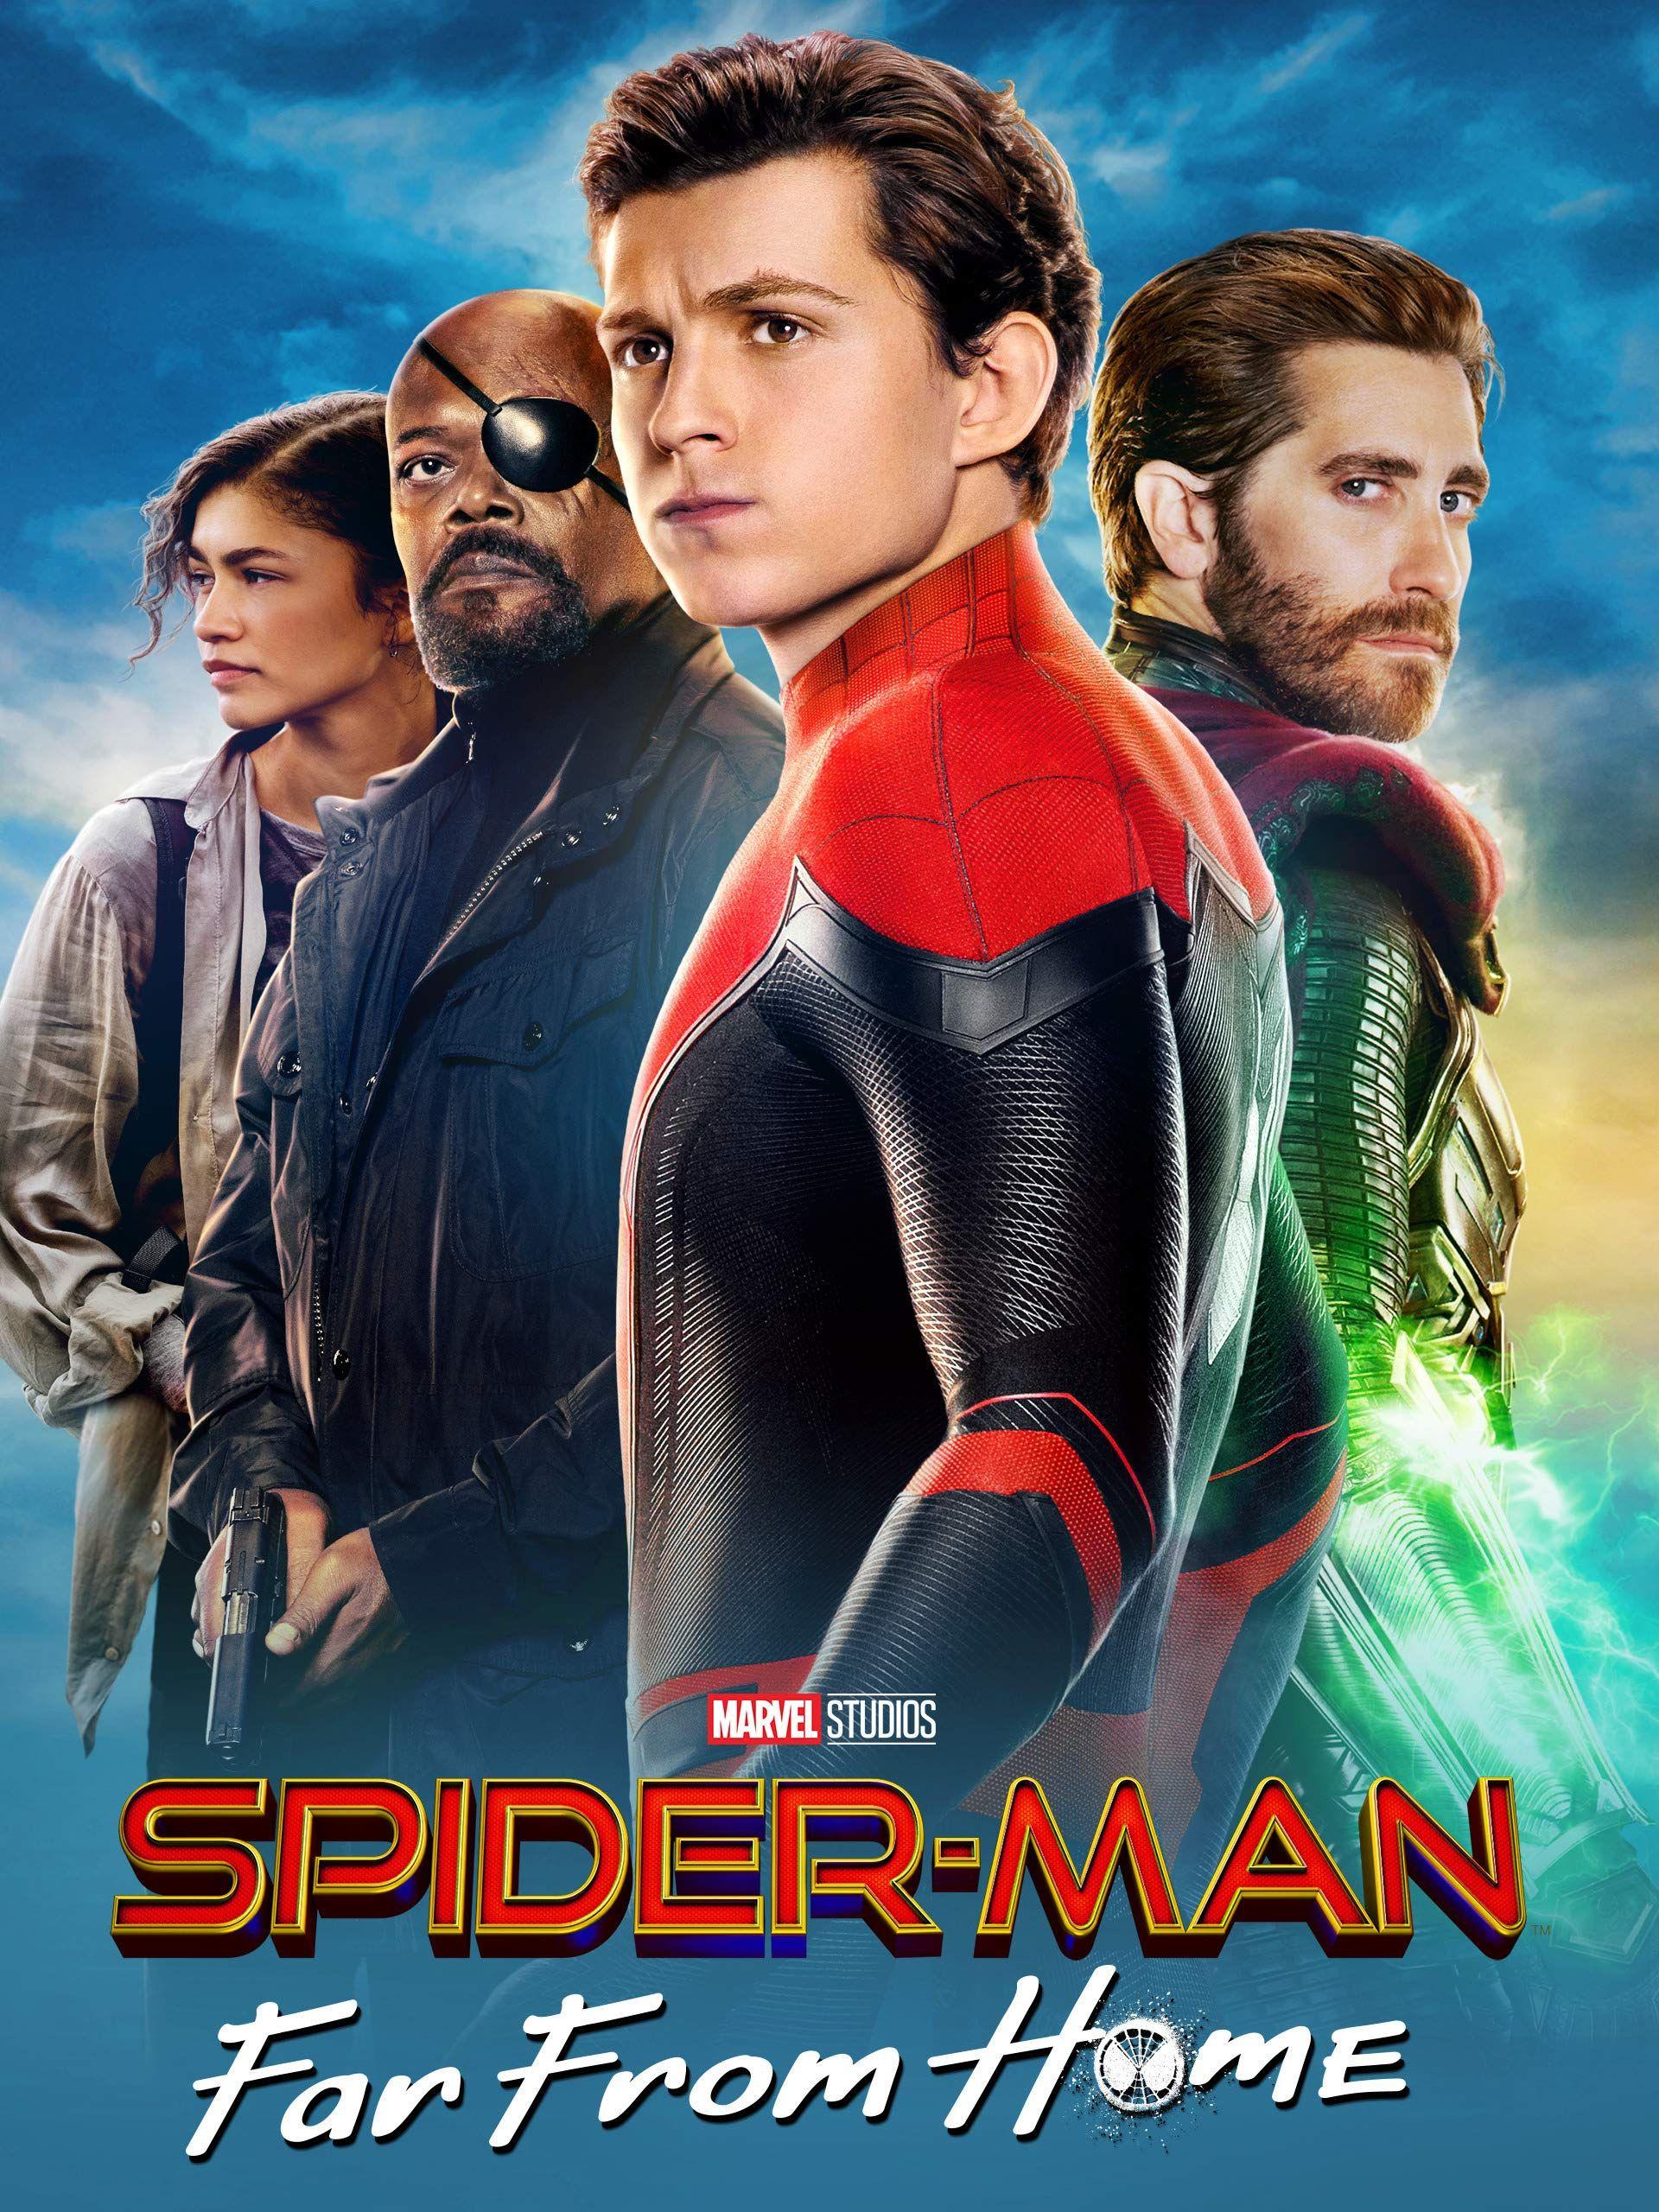 Spiderman Far from home kostenlos im Sky Store Adventskalender